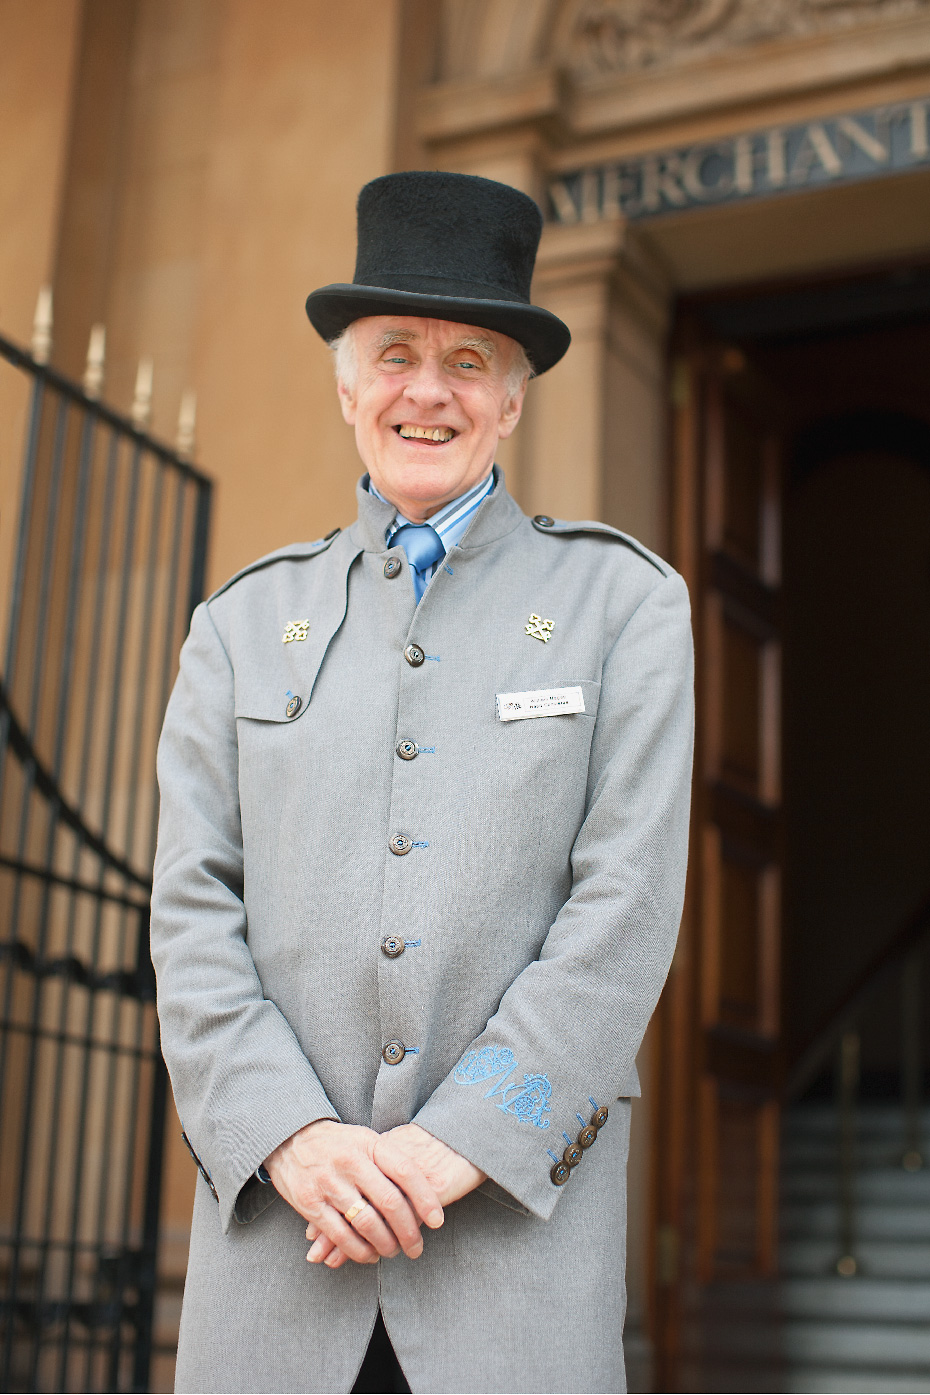 Stacey Van Berkel Photography I Bellman in top hat at the gorgeous Merchant Hotel I Belfast, Ireland